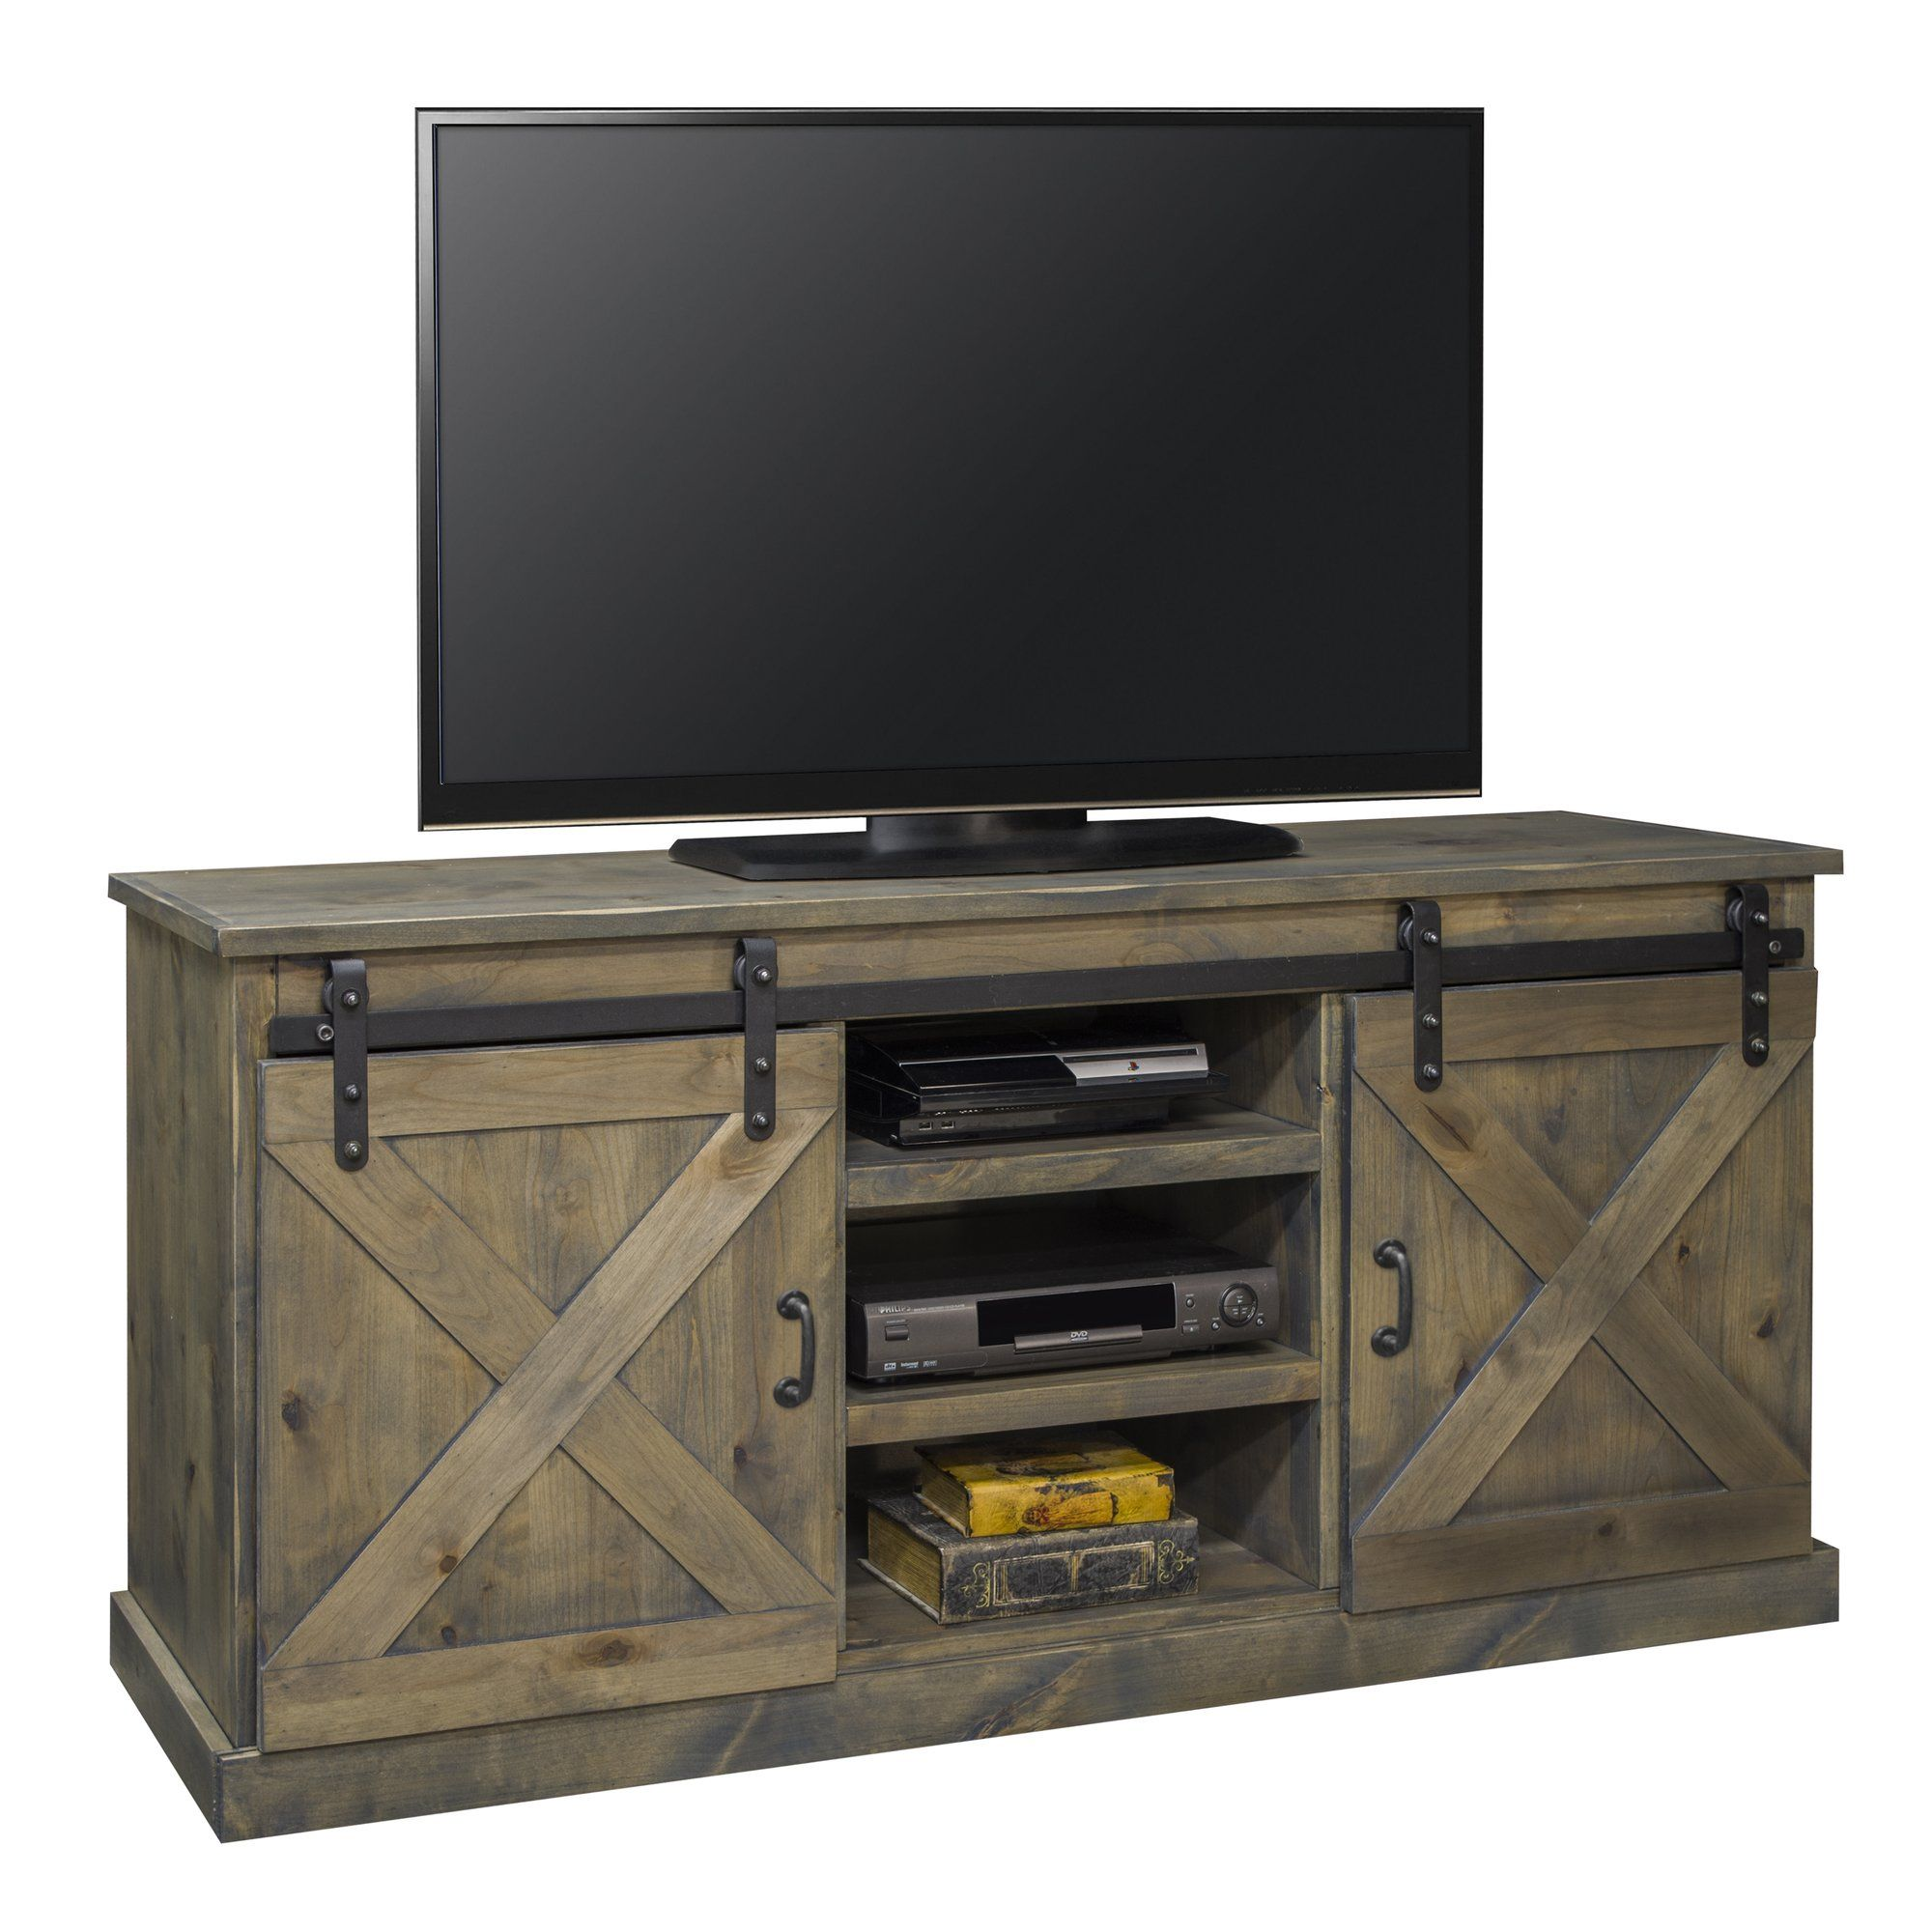 Birch lane media 900 in barn wood farmhouse tv